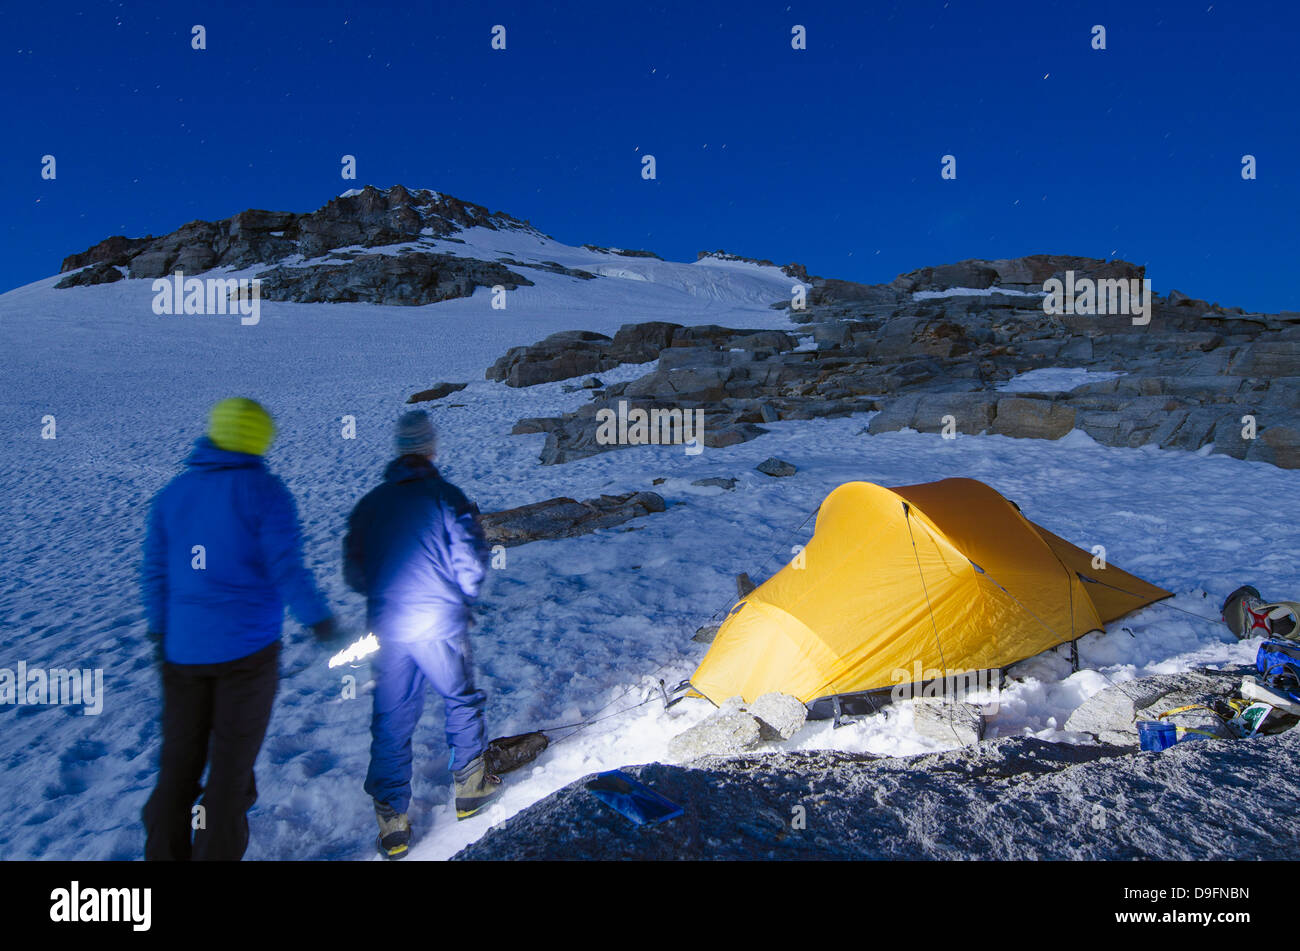 Gran Paradiso, 4061m, highest peak entirely in Italy, Gran Paradiso National Park, Aosta Valley, Italian Alps, Italy - Stock Image